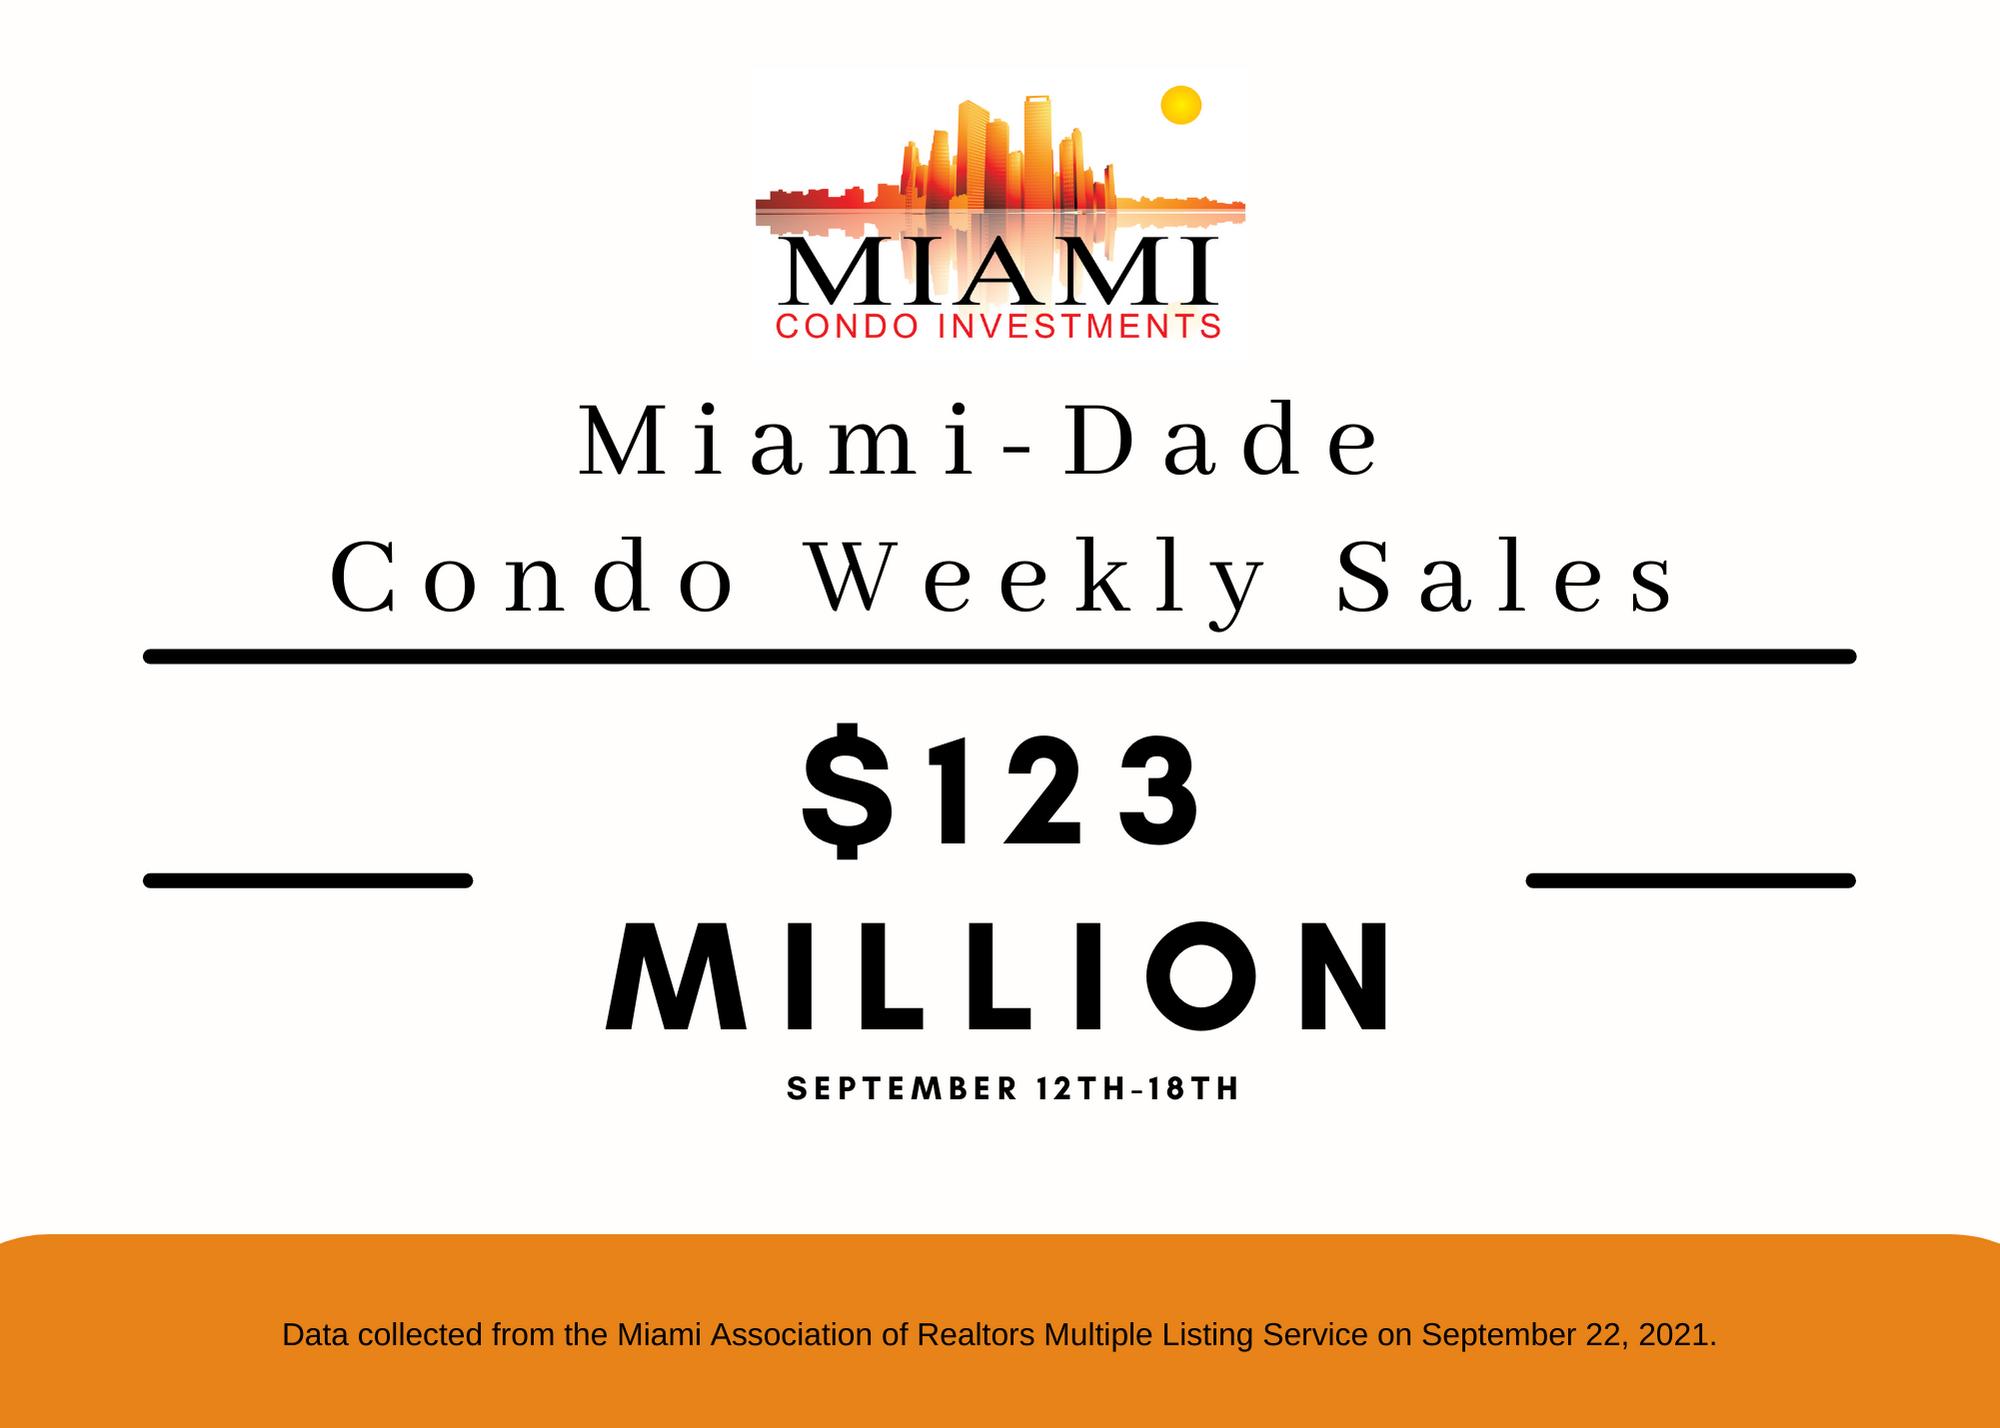 Miami Dade Weekly Condo Sales September 12th-18th